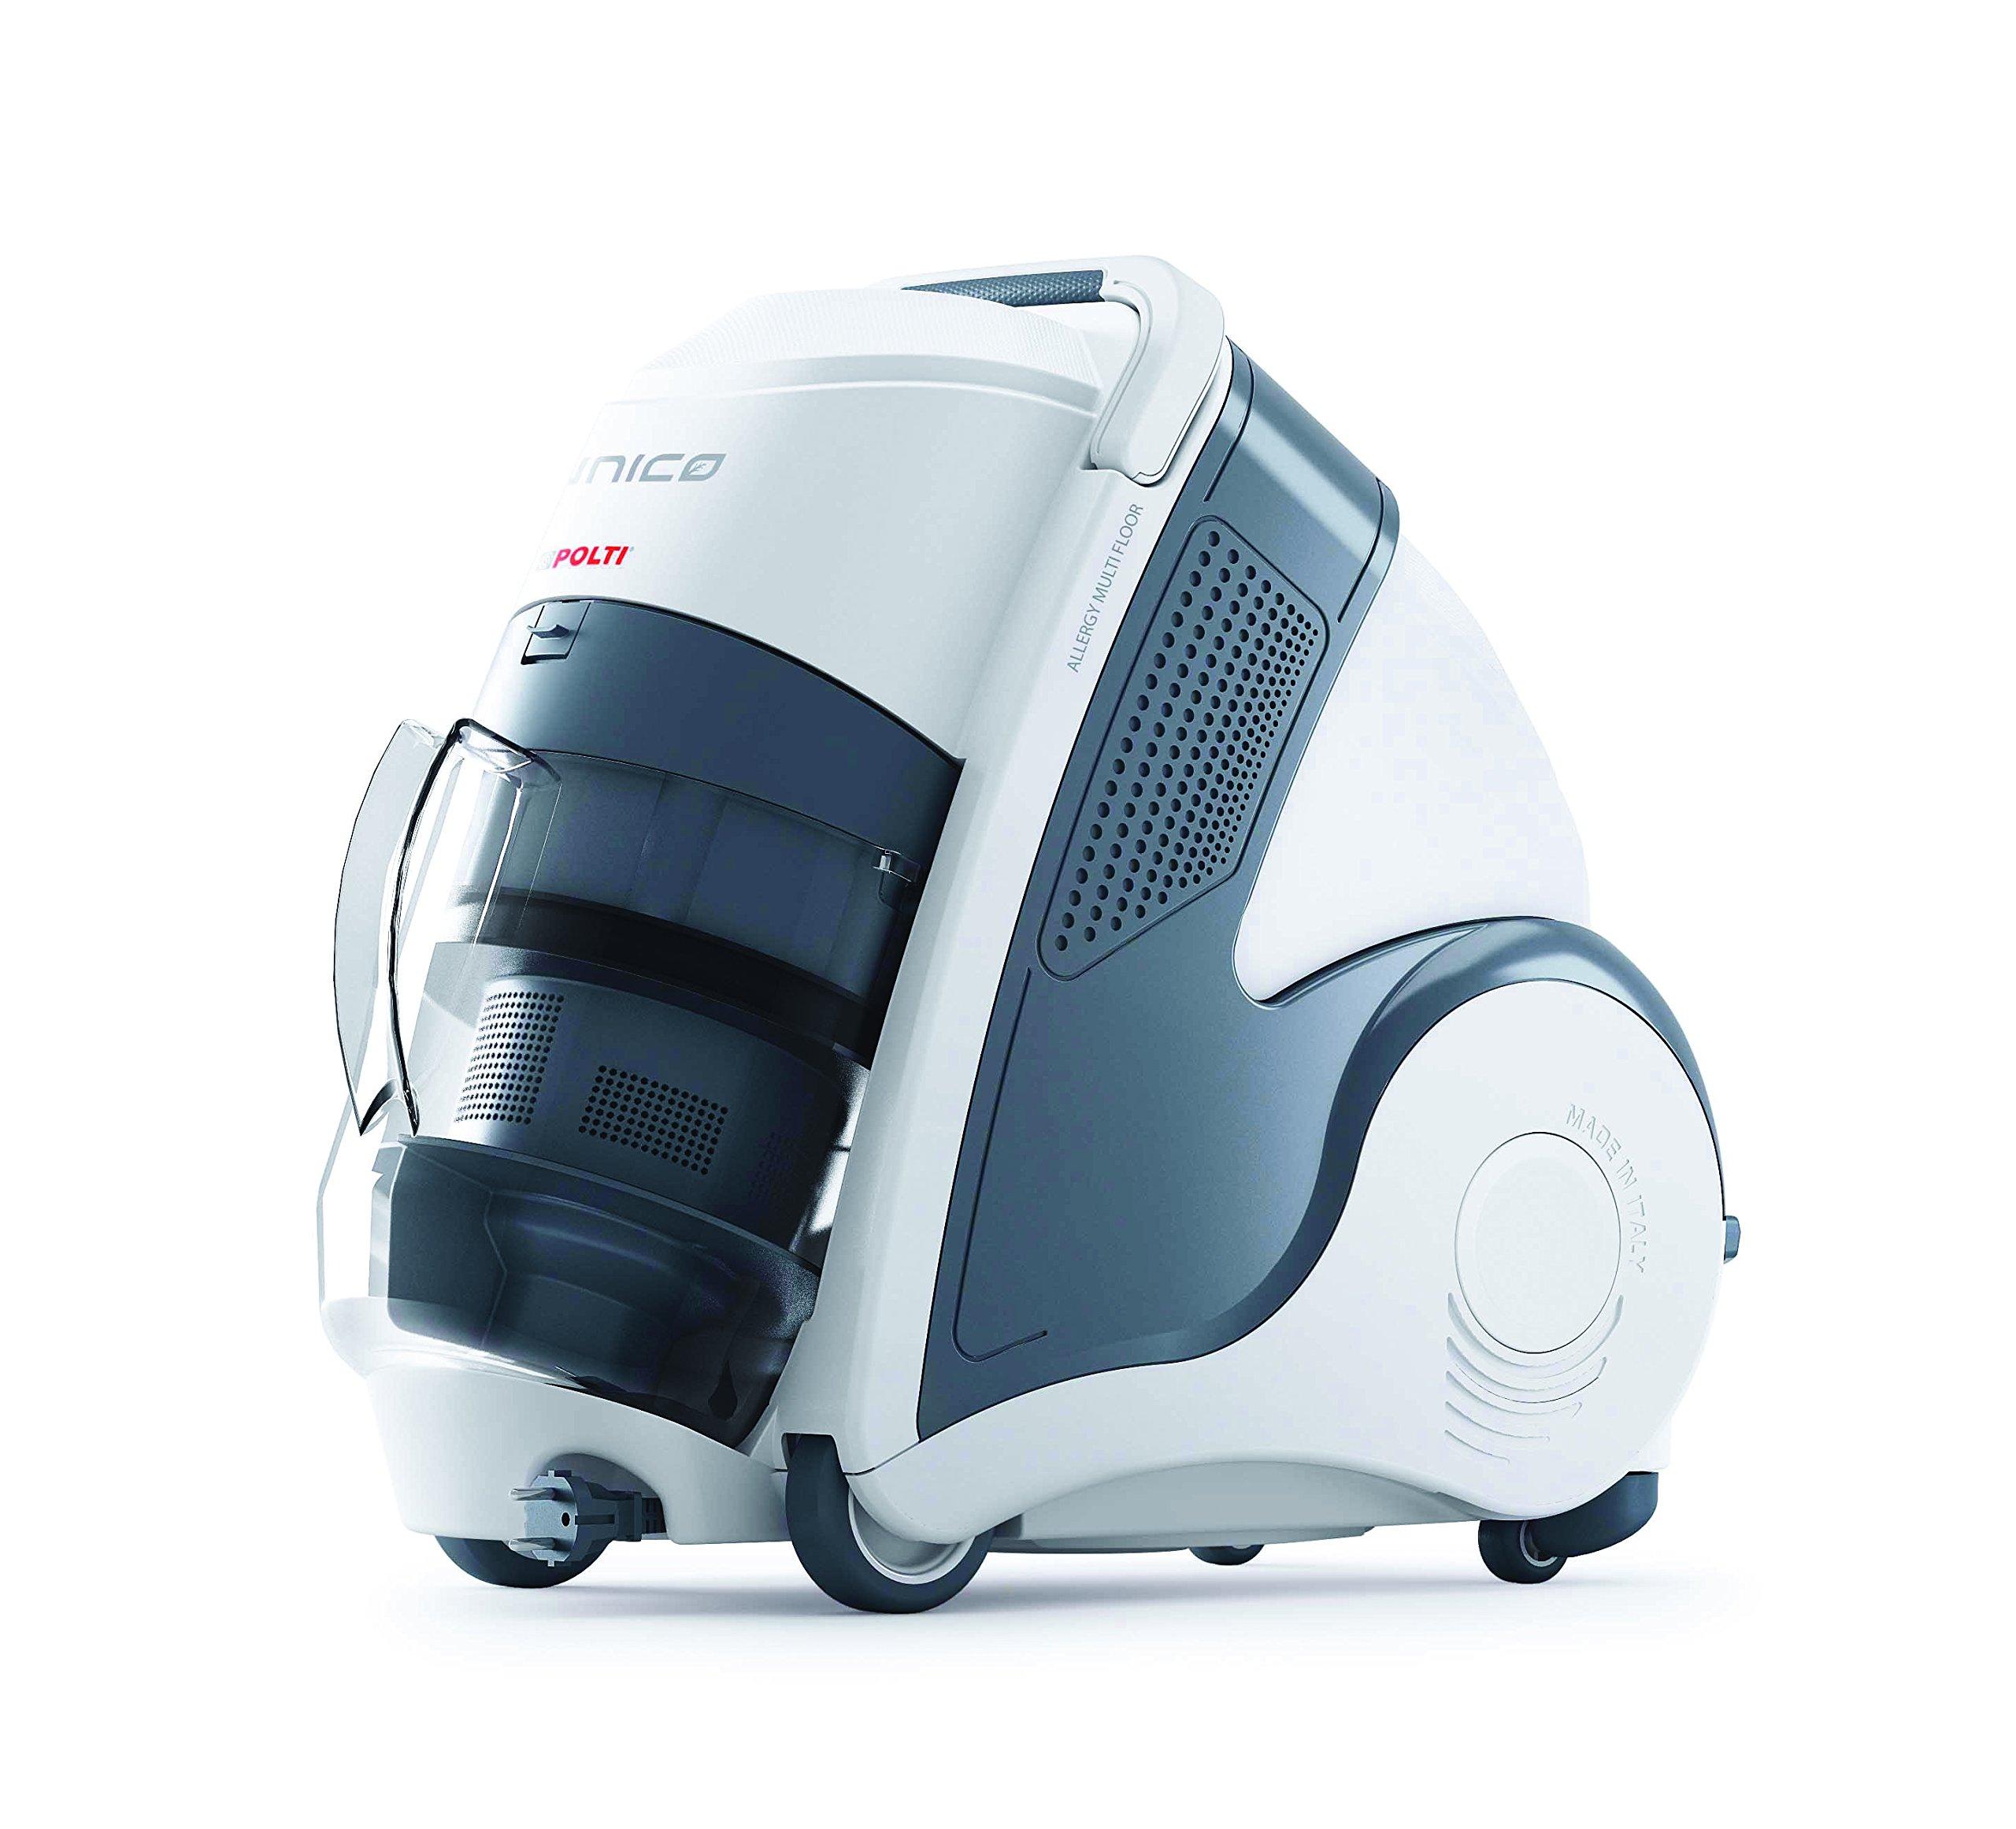 Polti Unico MCV20 Allergy Multifloor aspirador multiciclónico sin saco con limpiador a vapor integrado, 4 bar, Gris/Blanco (ricondizionato Certificado): Amazon.es: Hogar